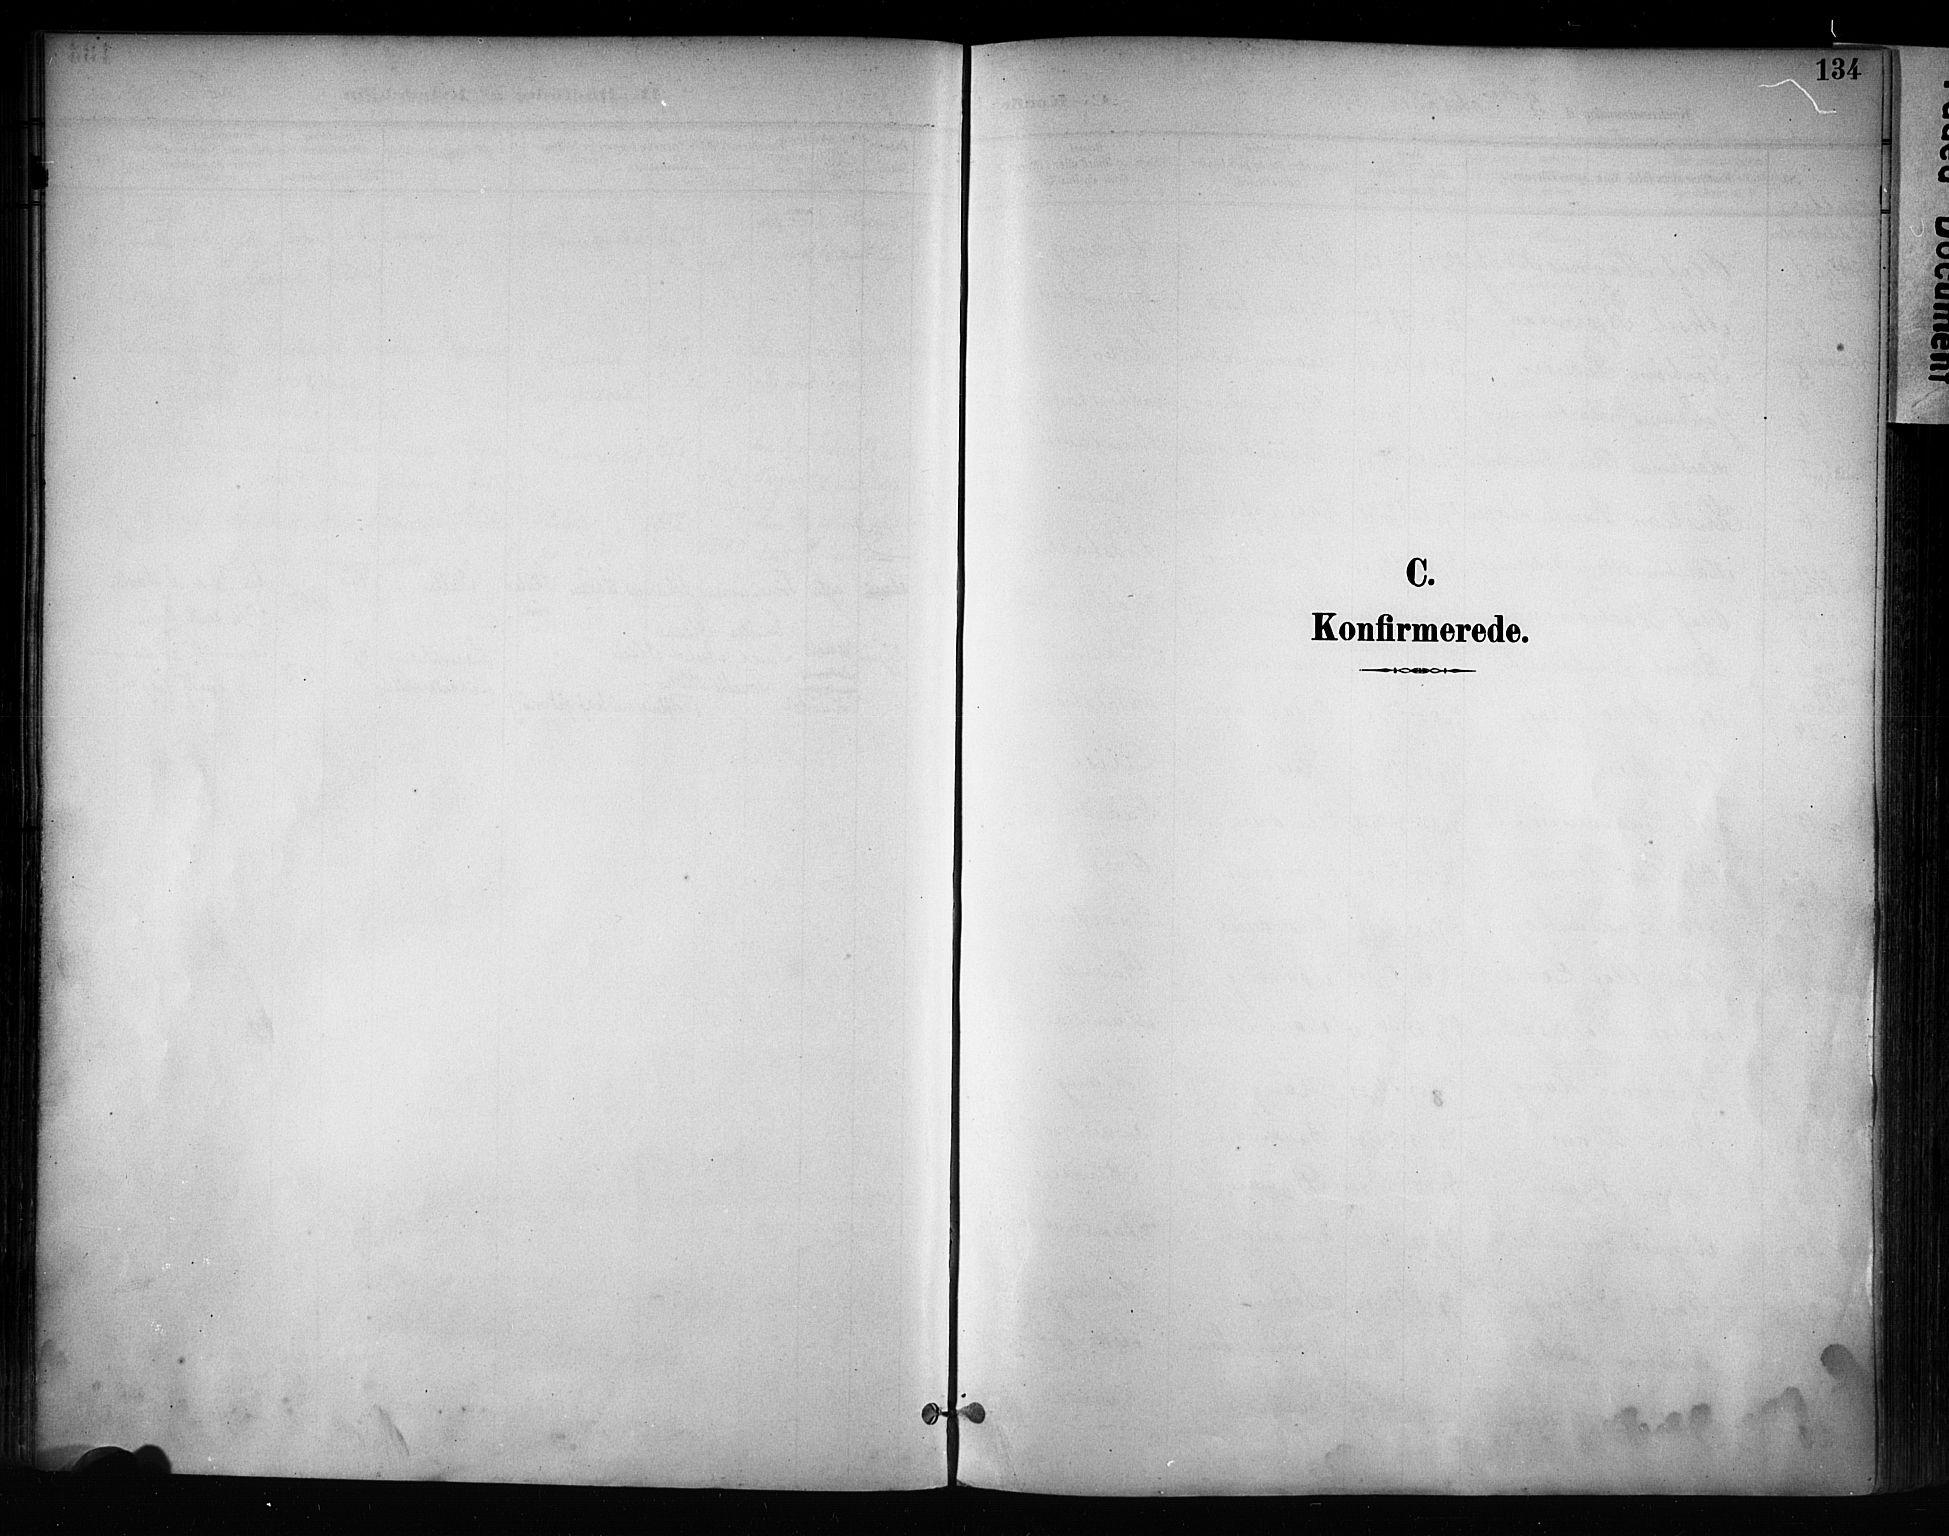 SAH, Østre Toten prestekontor, Ministerialbok nr. 8, 1897-1909, s. 134